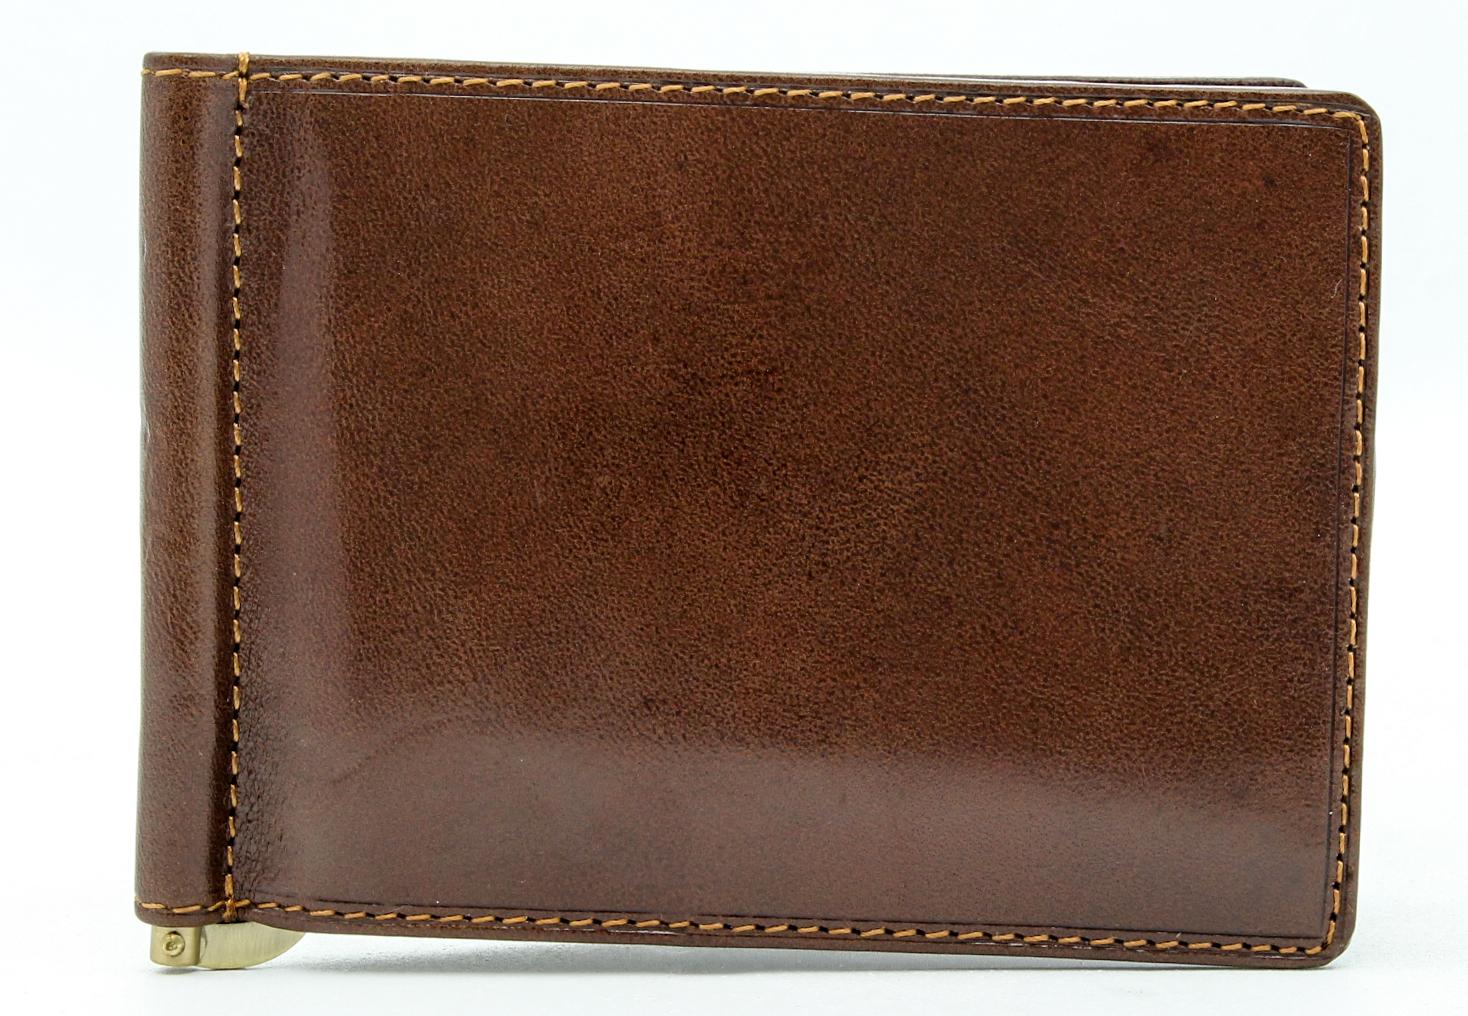 Tony-Perotti-Italian-Leather-Executive-Credit-Card-Money-Clip-Wallet thumbnail 7